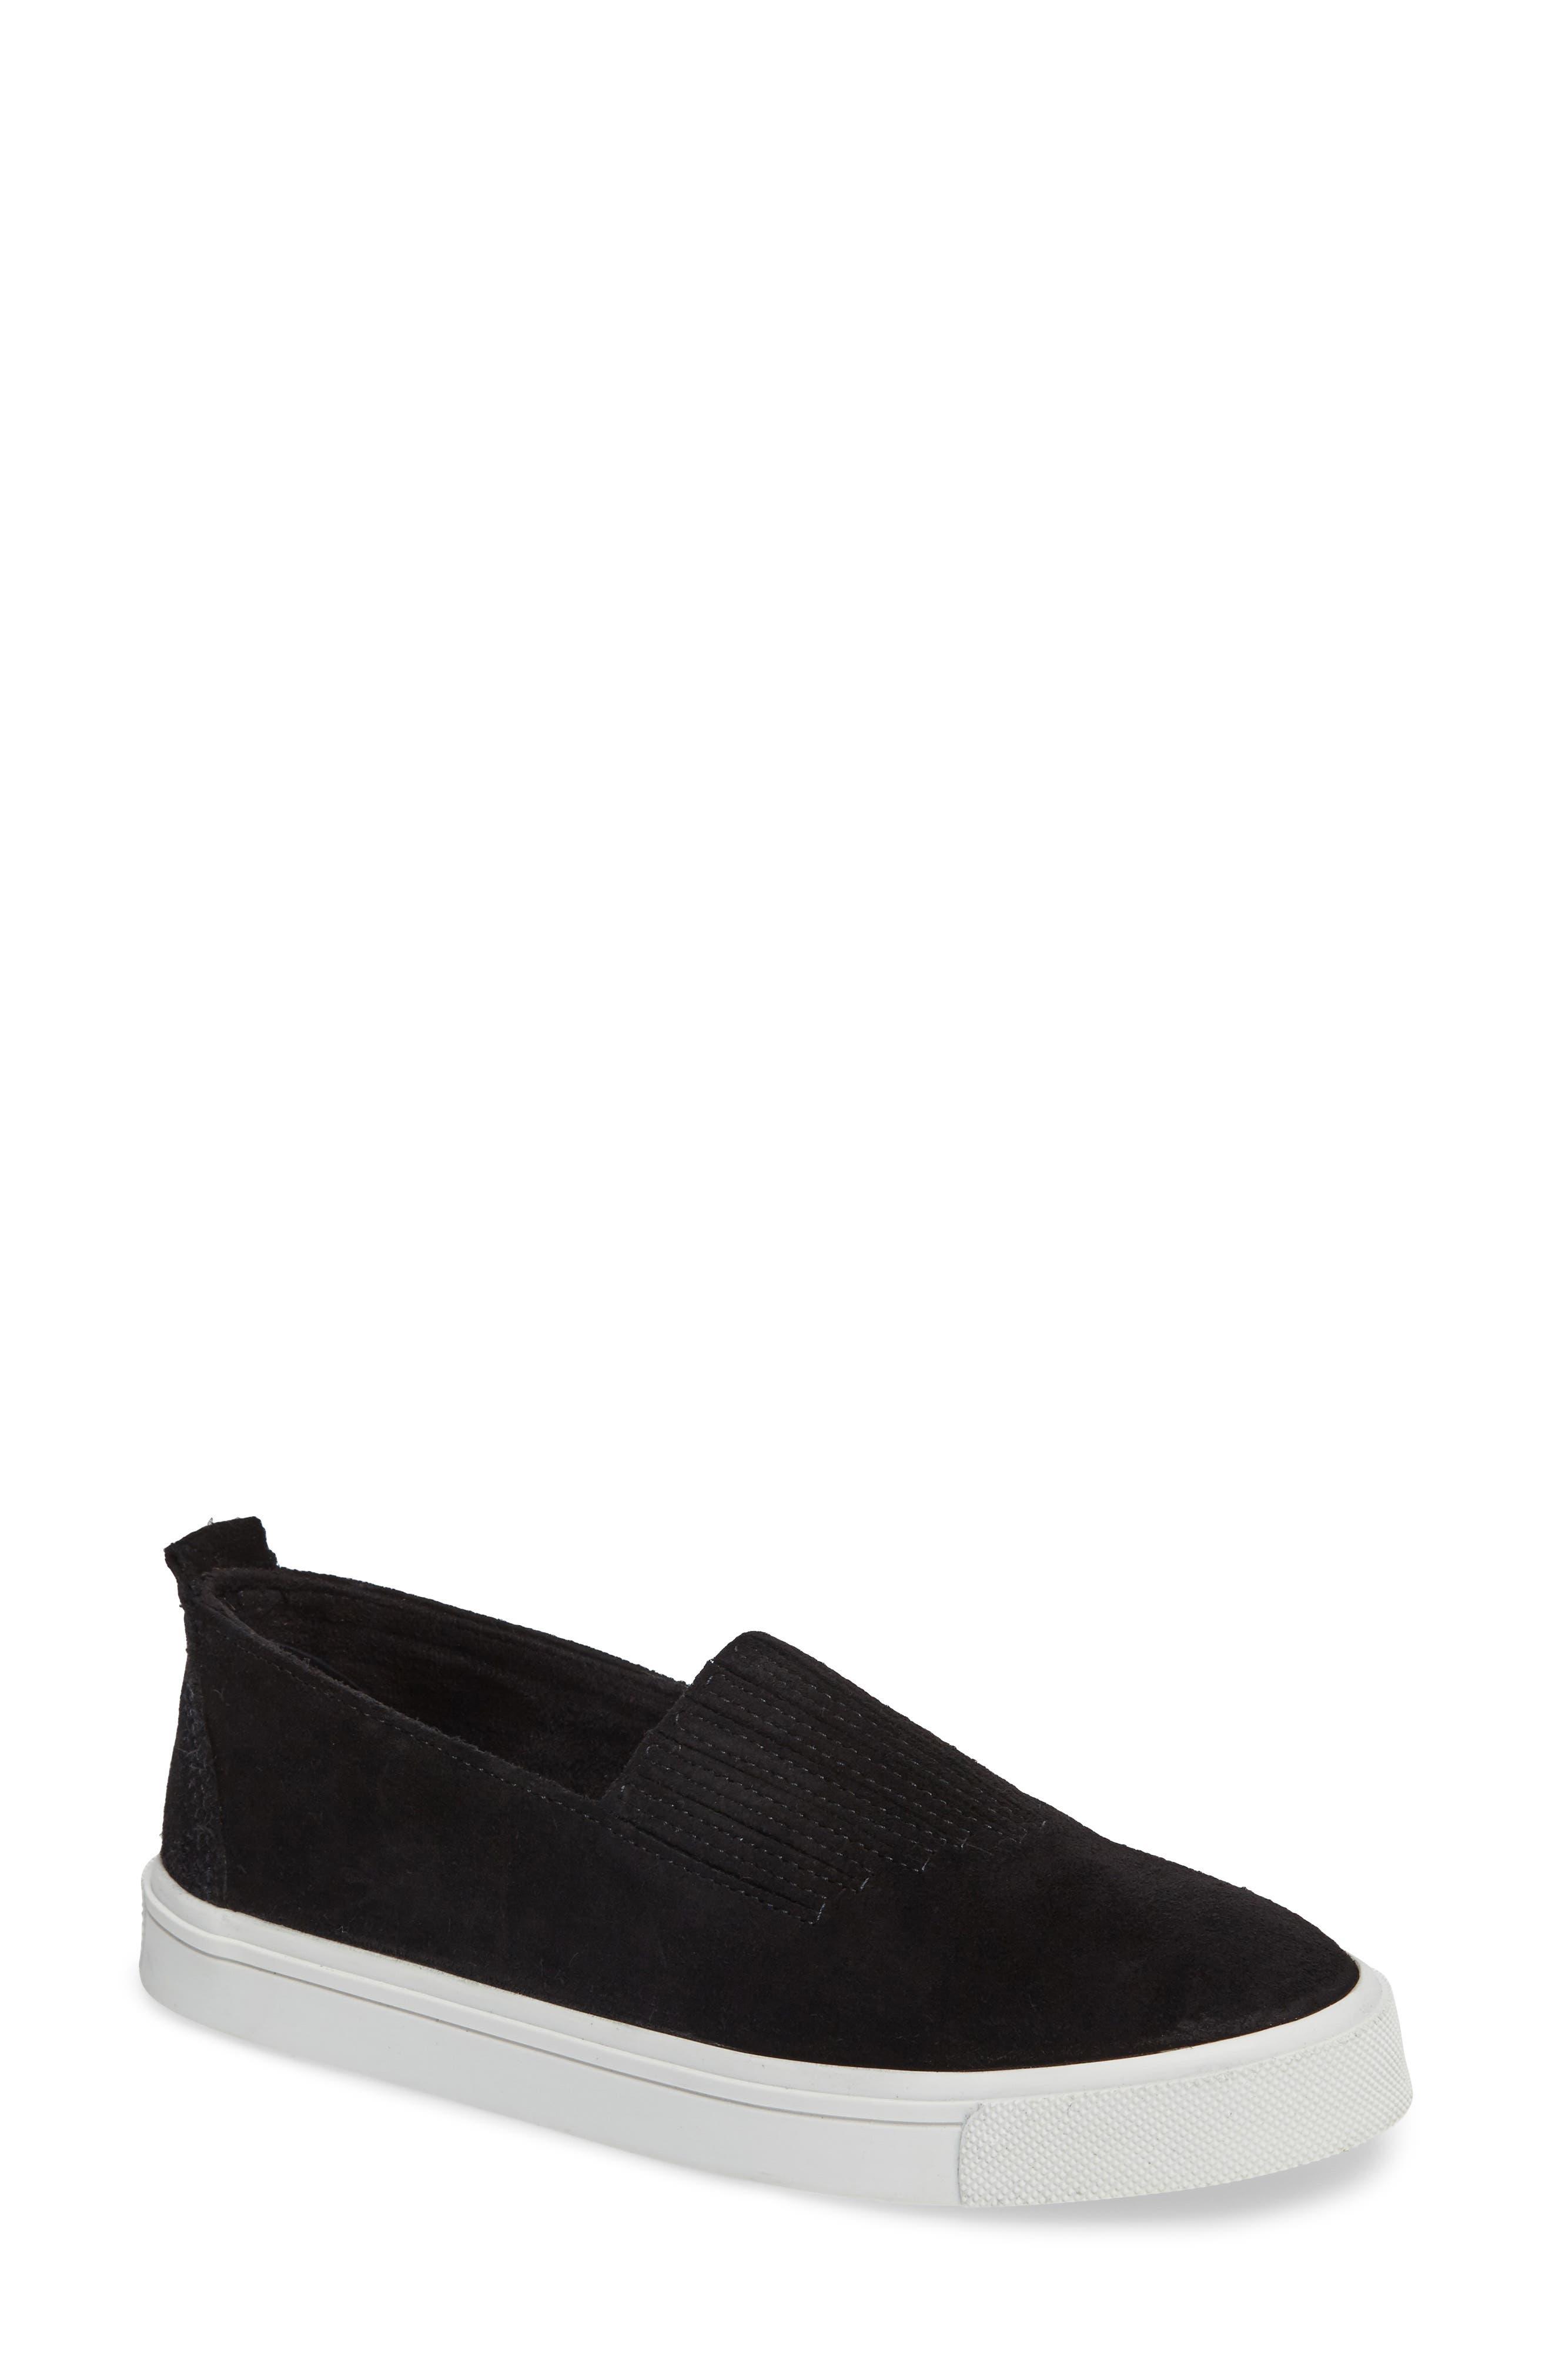 MINNETONKA Gabi Slip-On Sneaker, Main, color, BLACK